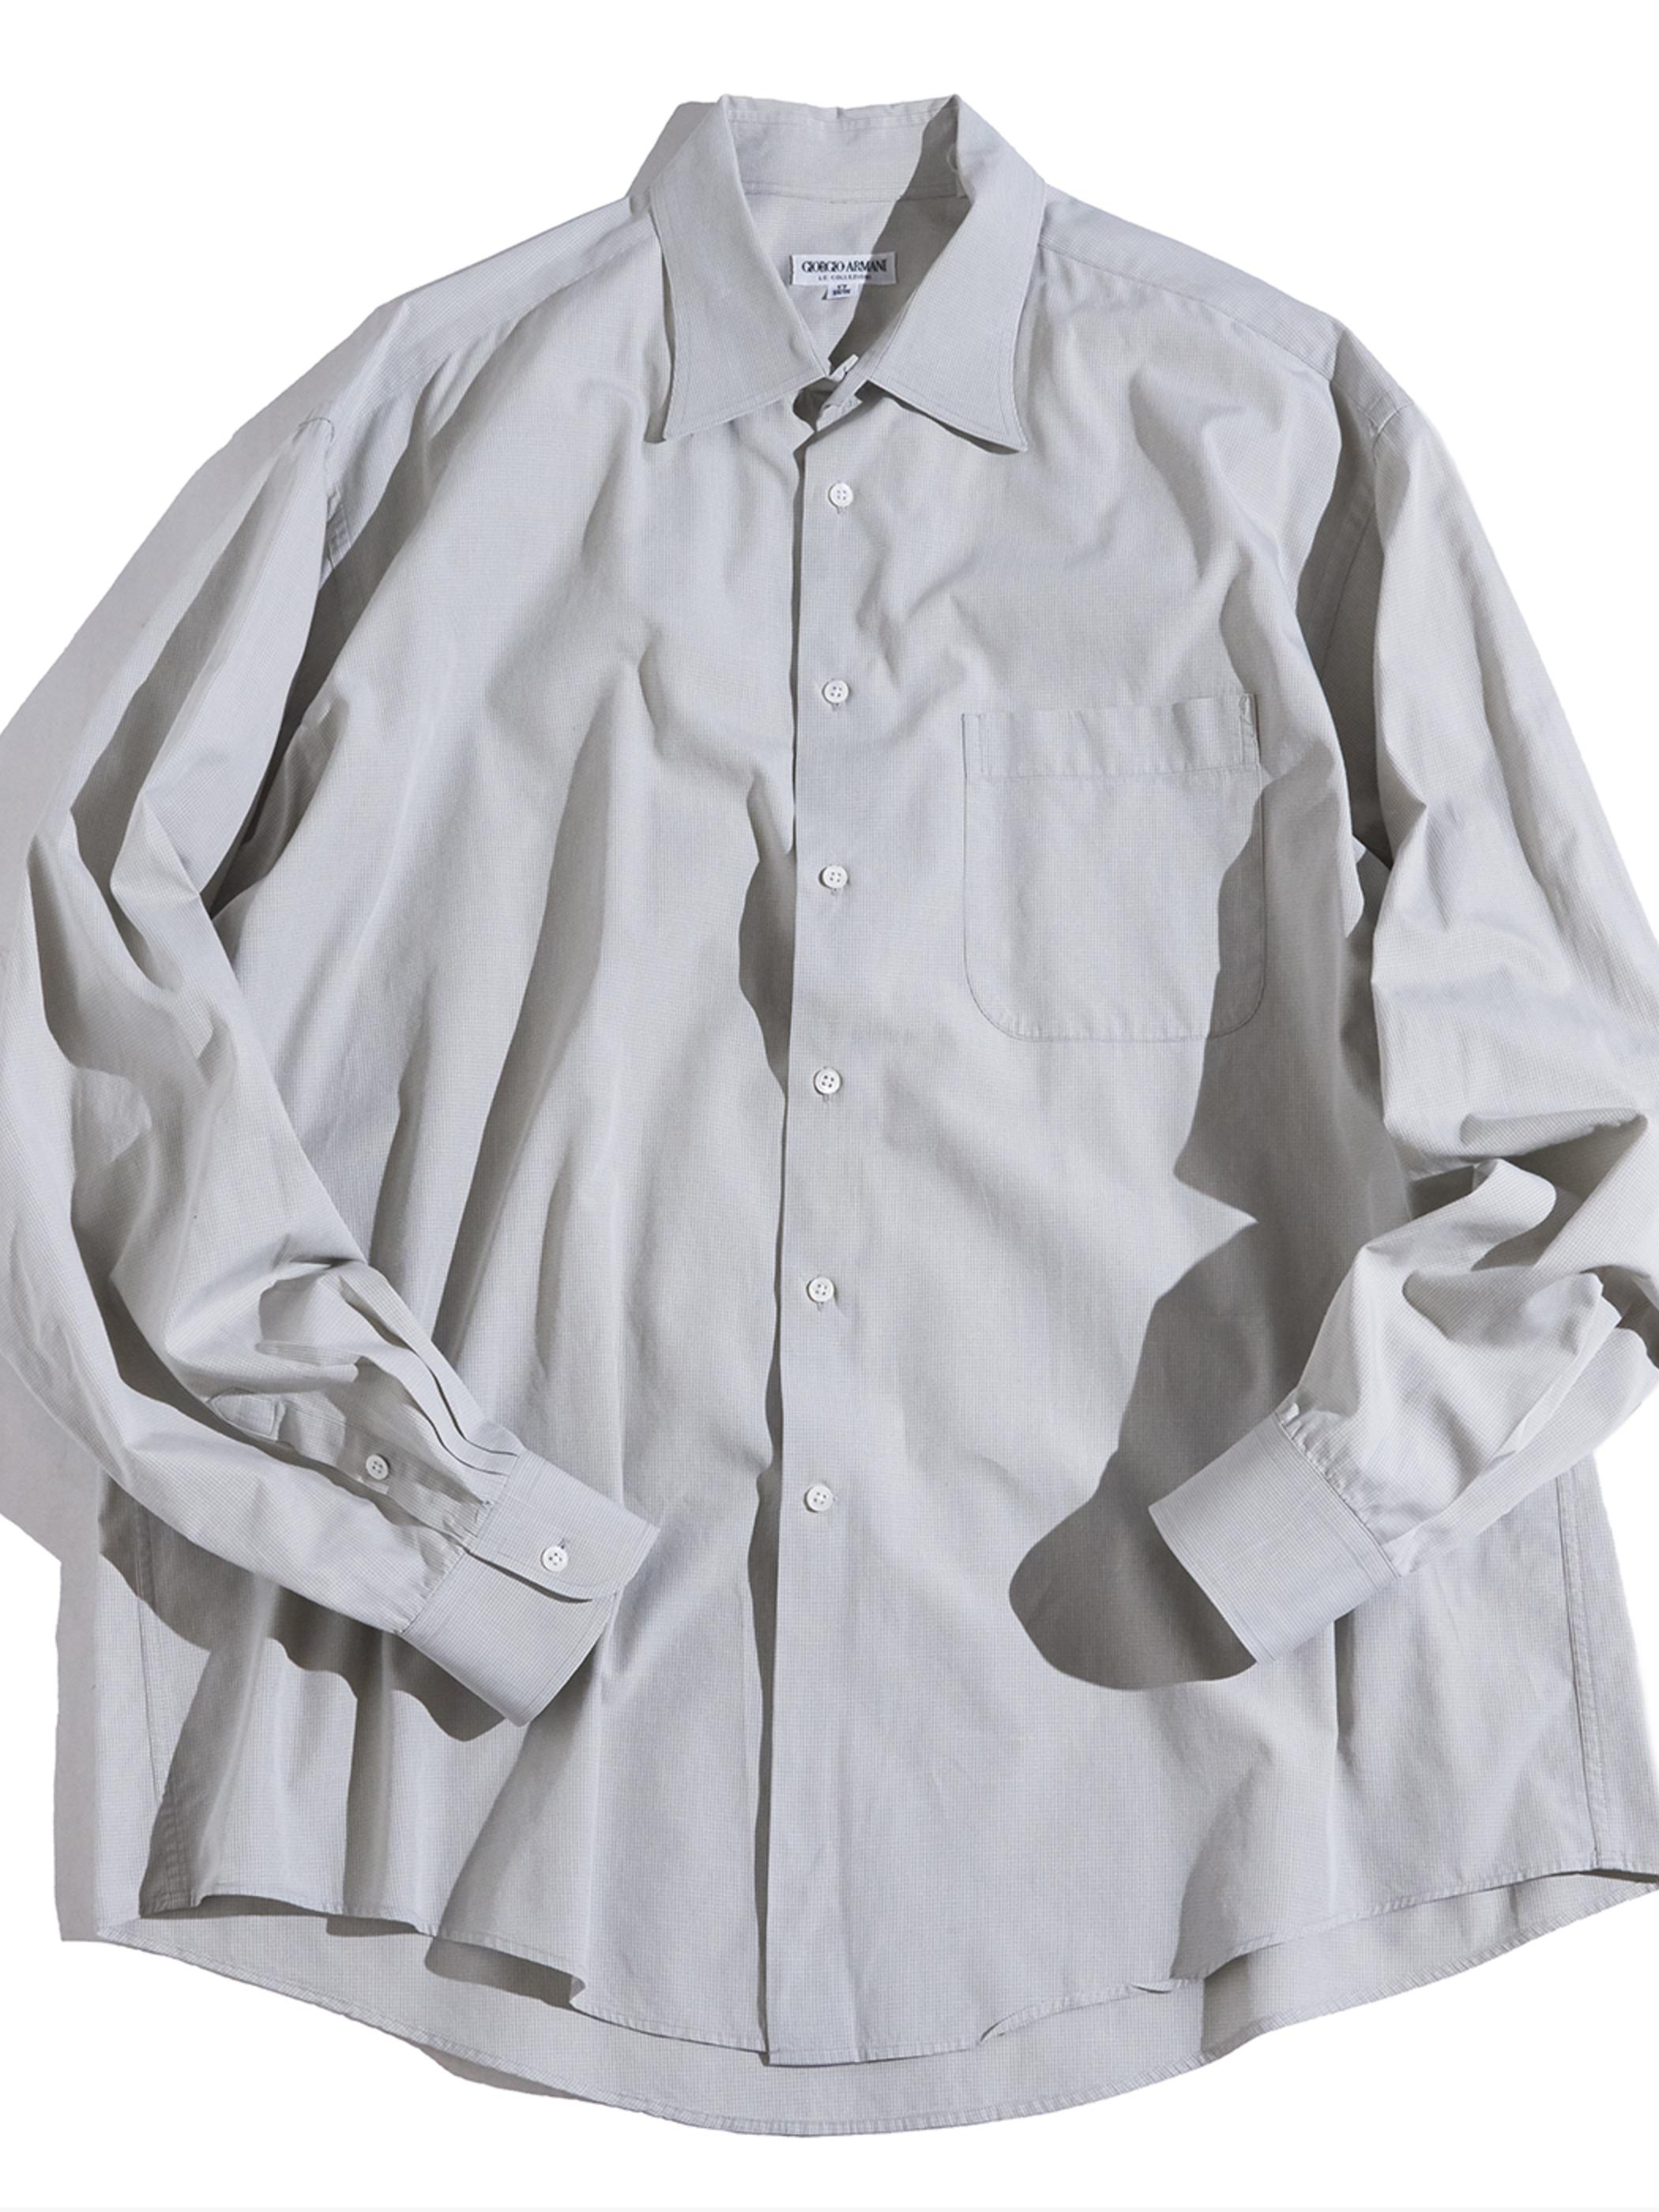 "1980s "" GIORGIO ARMANI"" check dress shirt -GREY-"